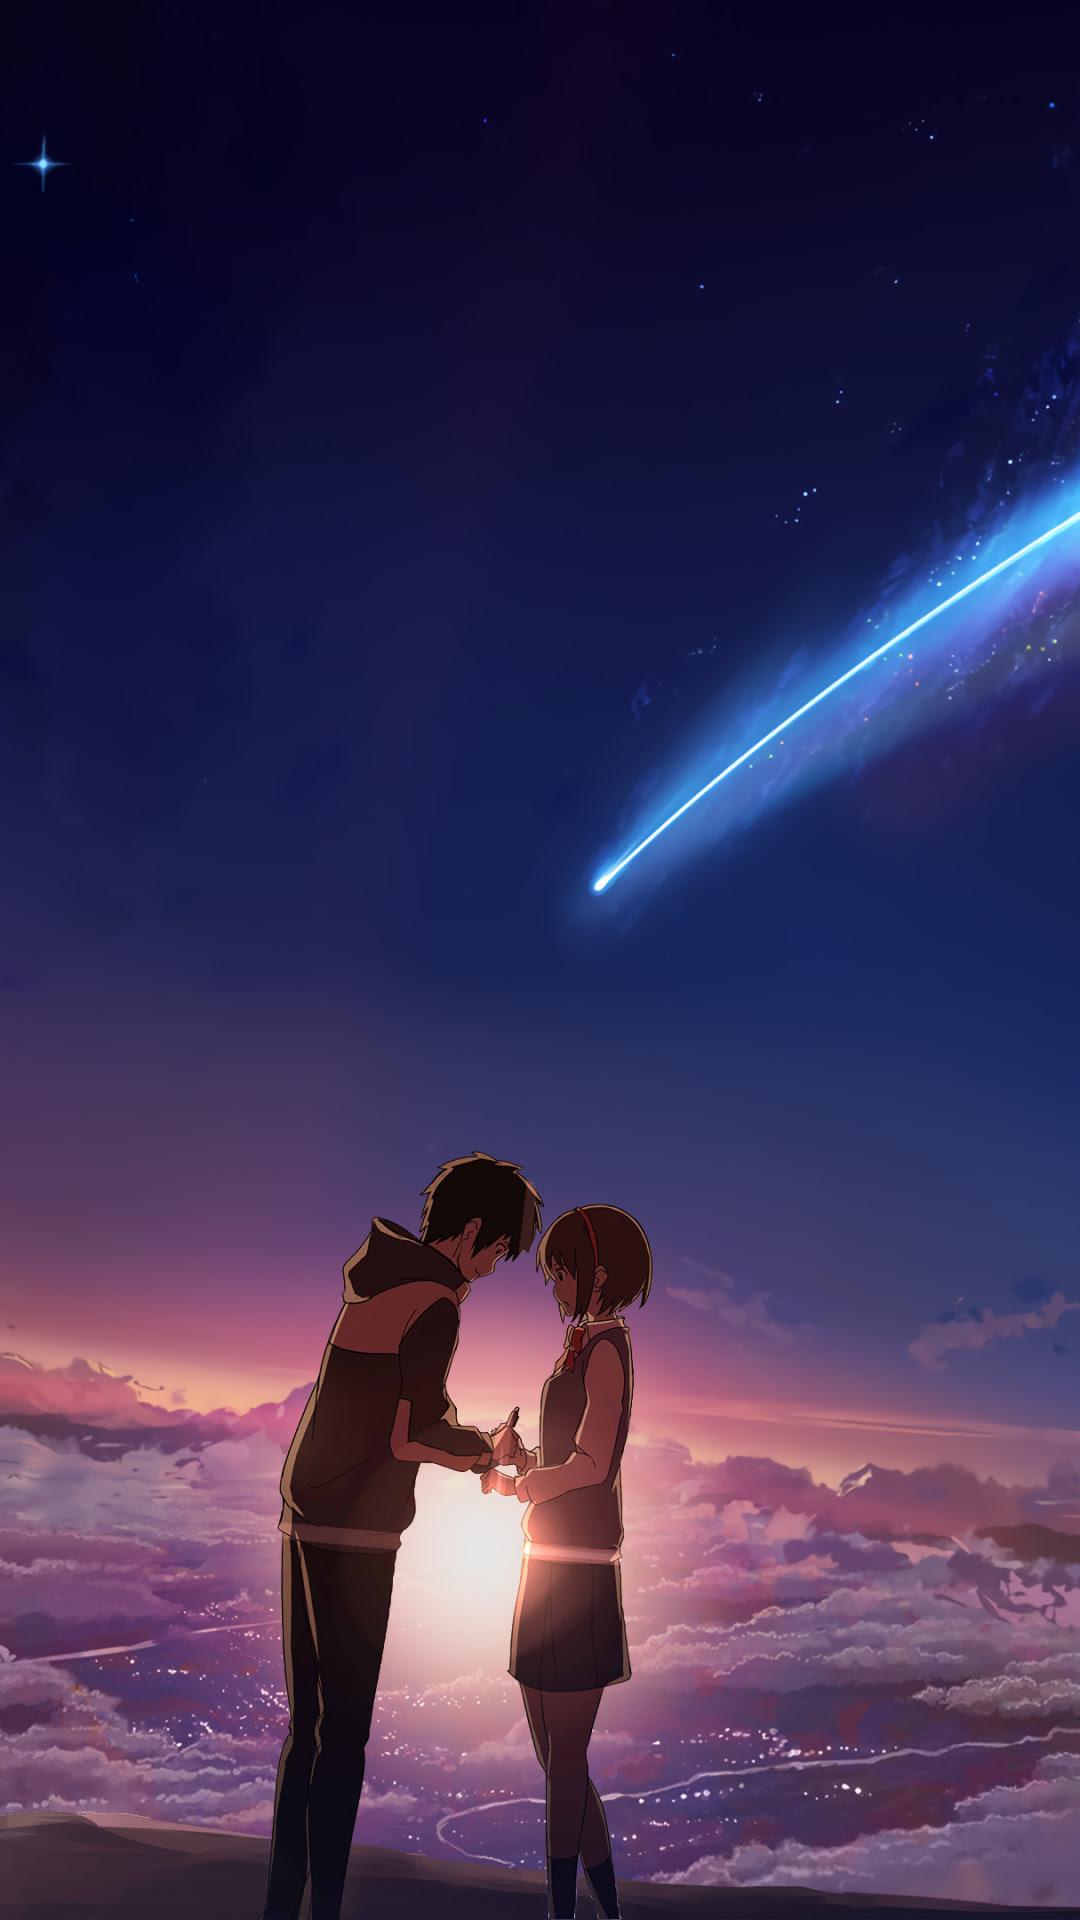 Wallpaper Anime Romantis : wallpaper, anime, romantis, Wallpaper, Anime, Romantic, Tachi